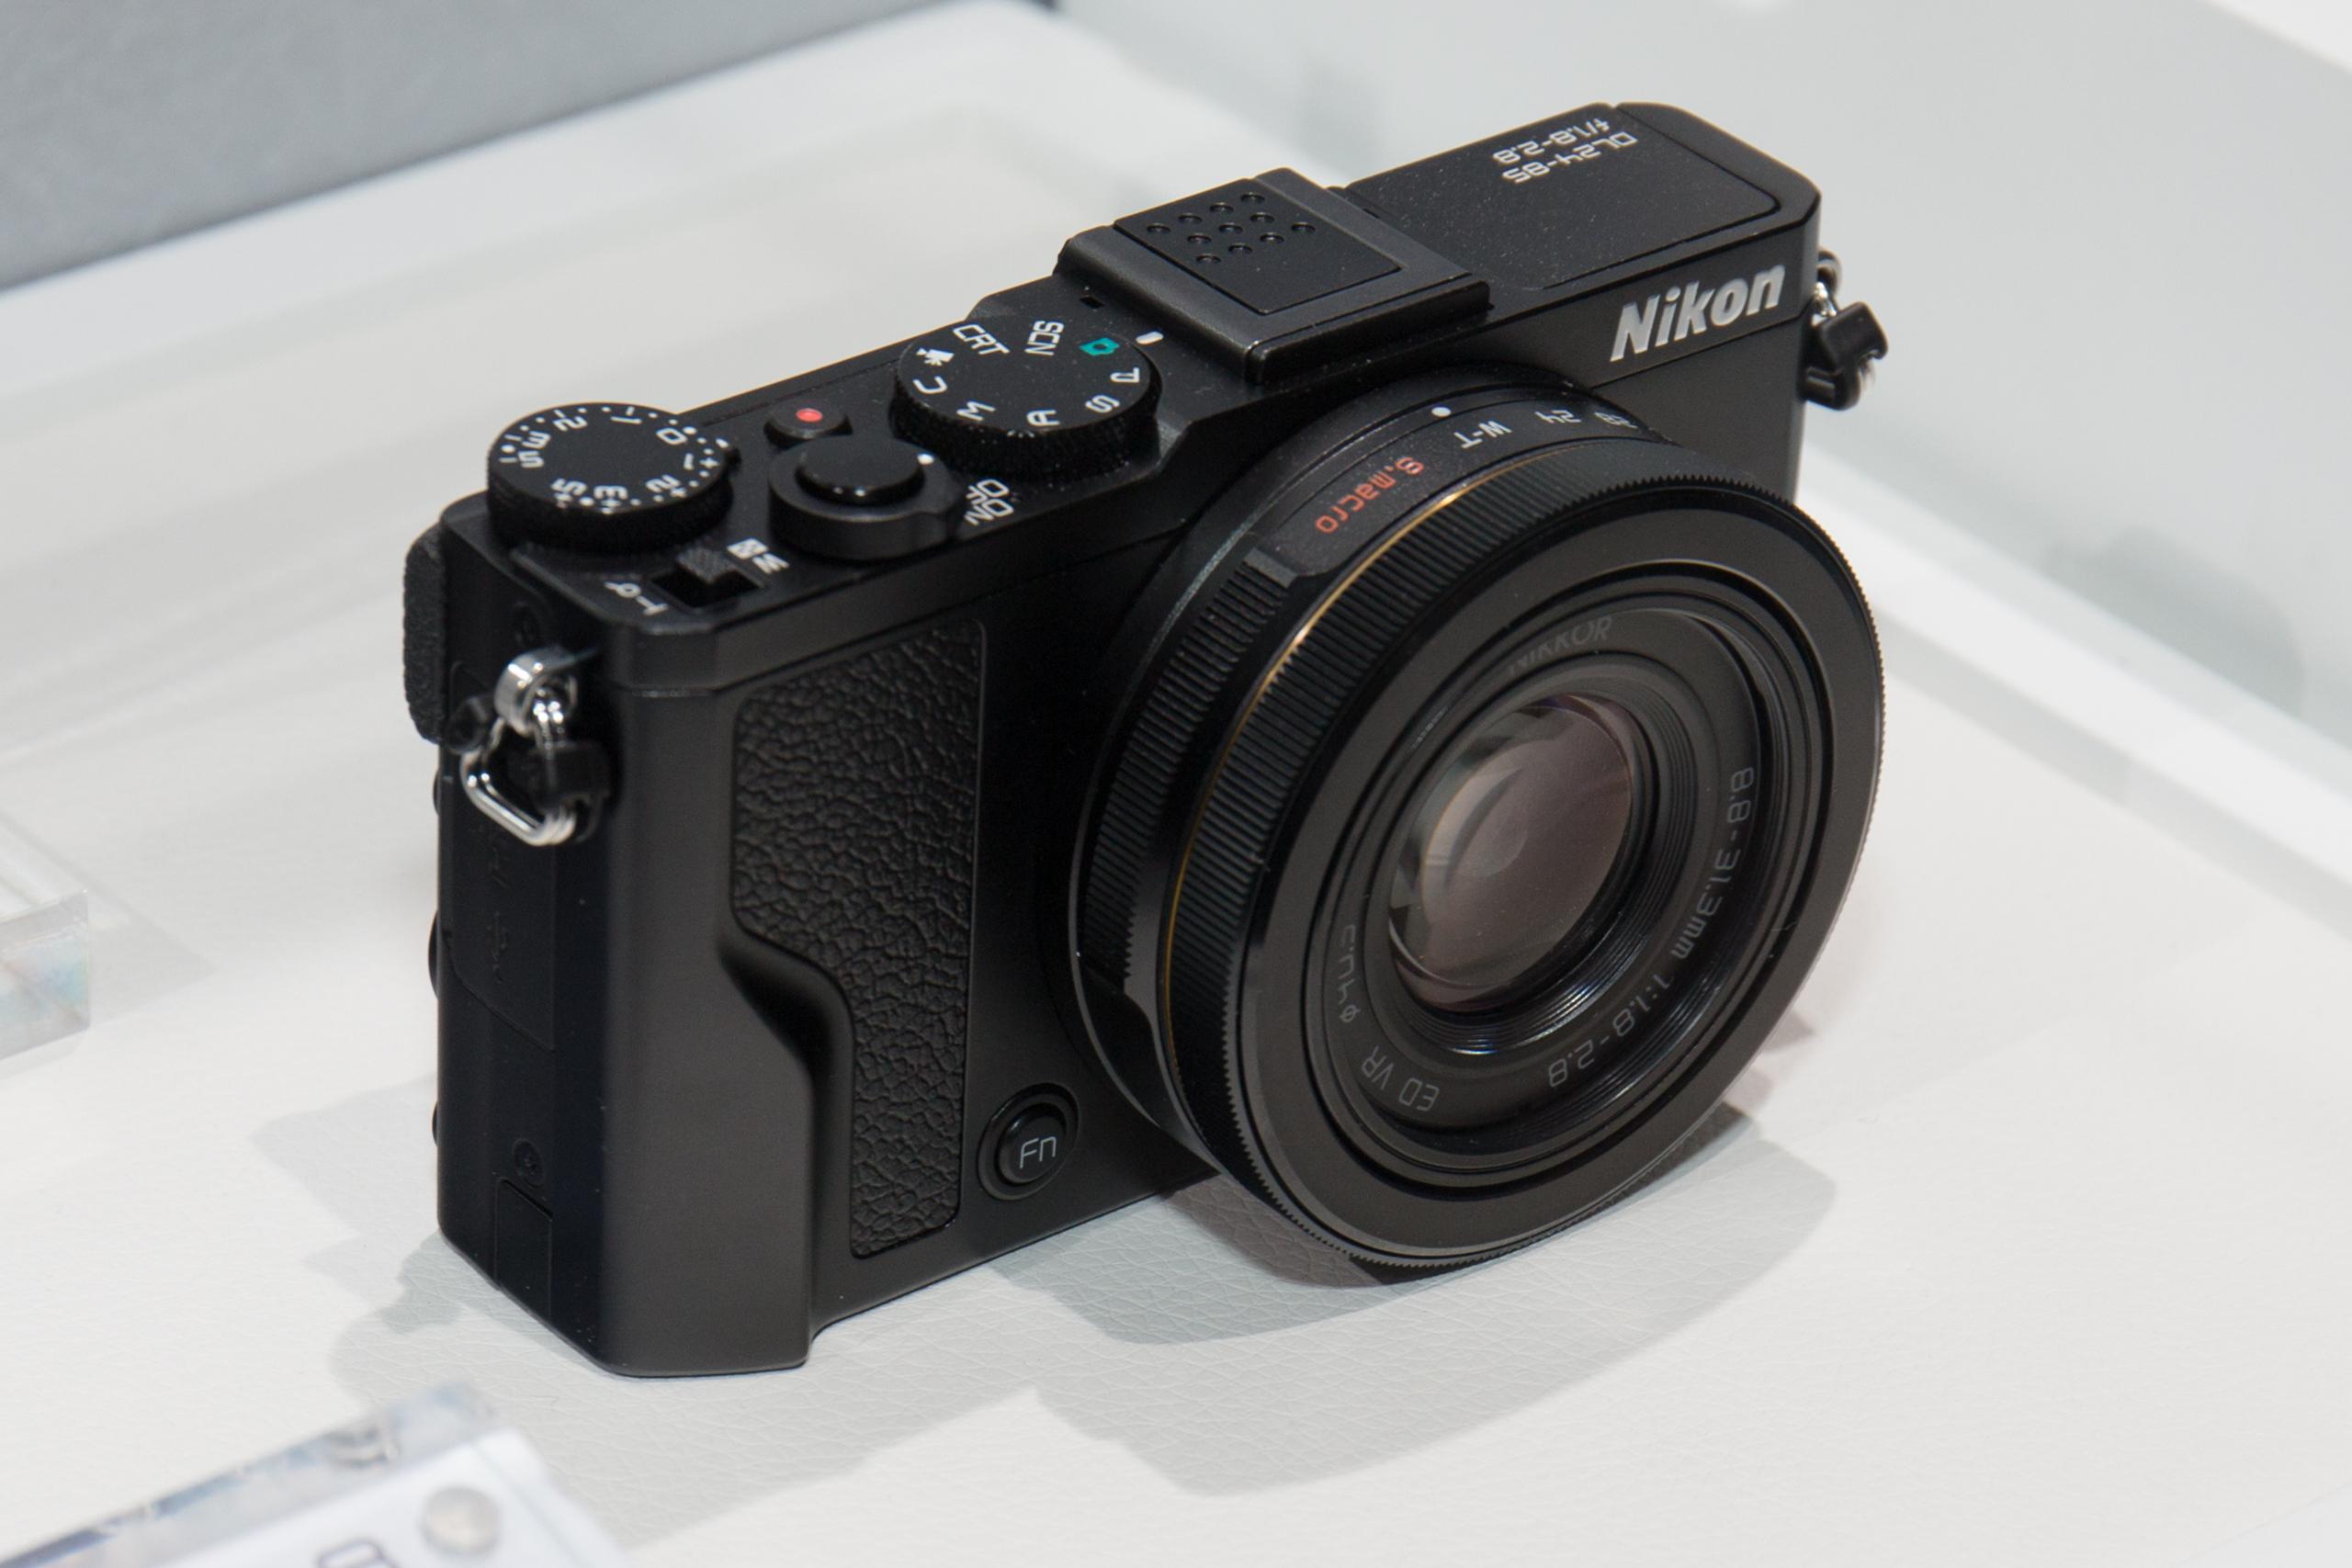 Noble Nikon Dl24 85 Front Right 2016 China P26e Nikon Dl24 85 Ebay Nikon Dl24 85 Release Date Uk dpreview Nikon Dl24 85